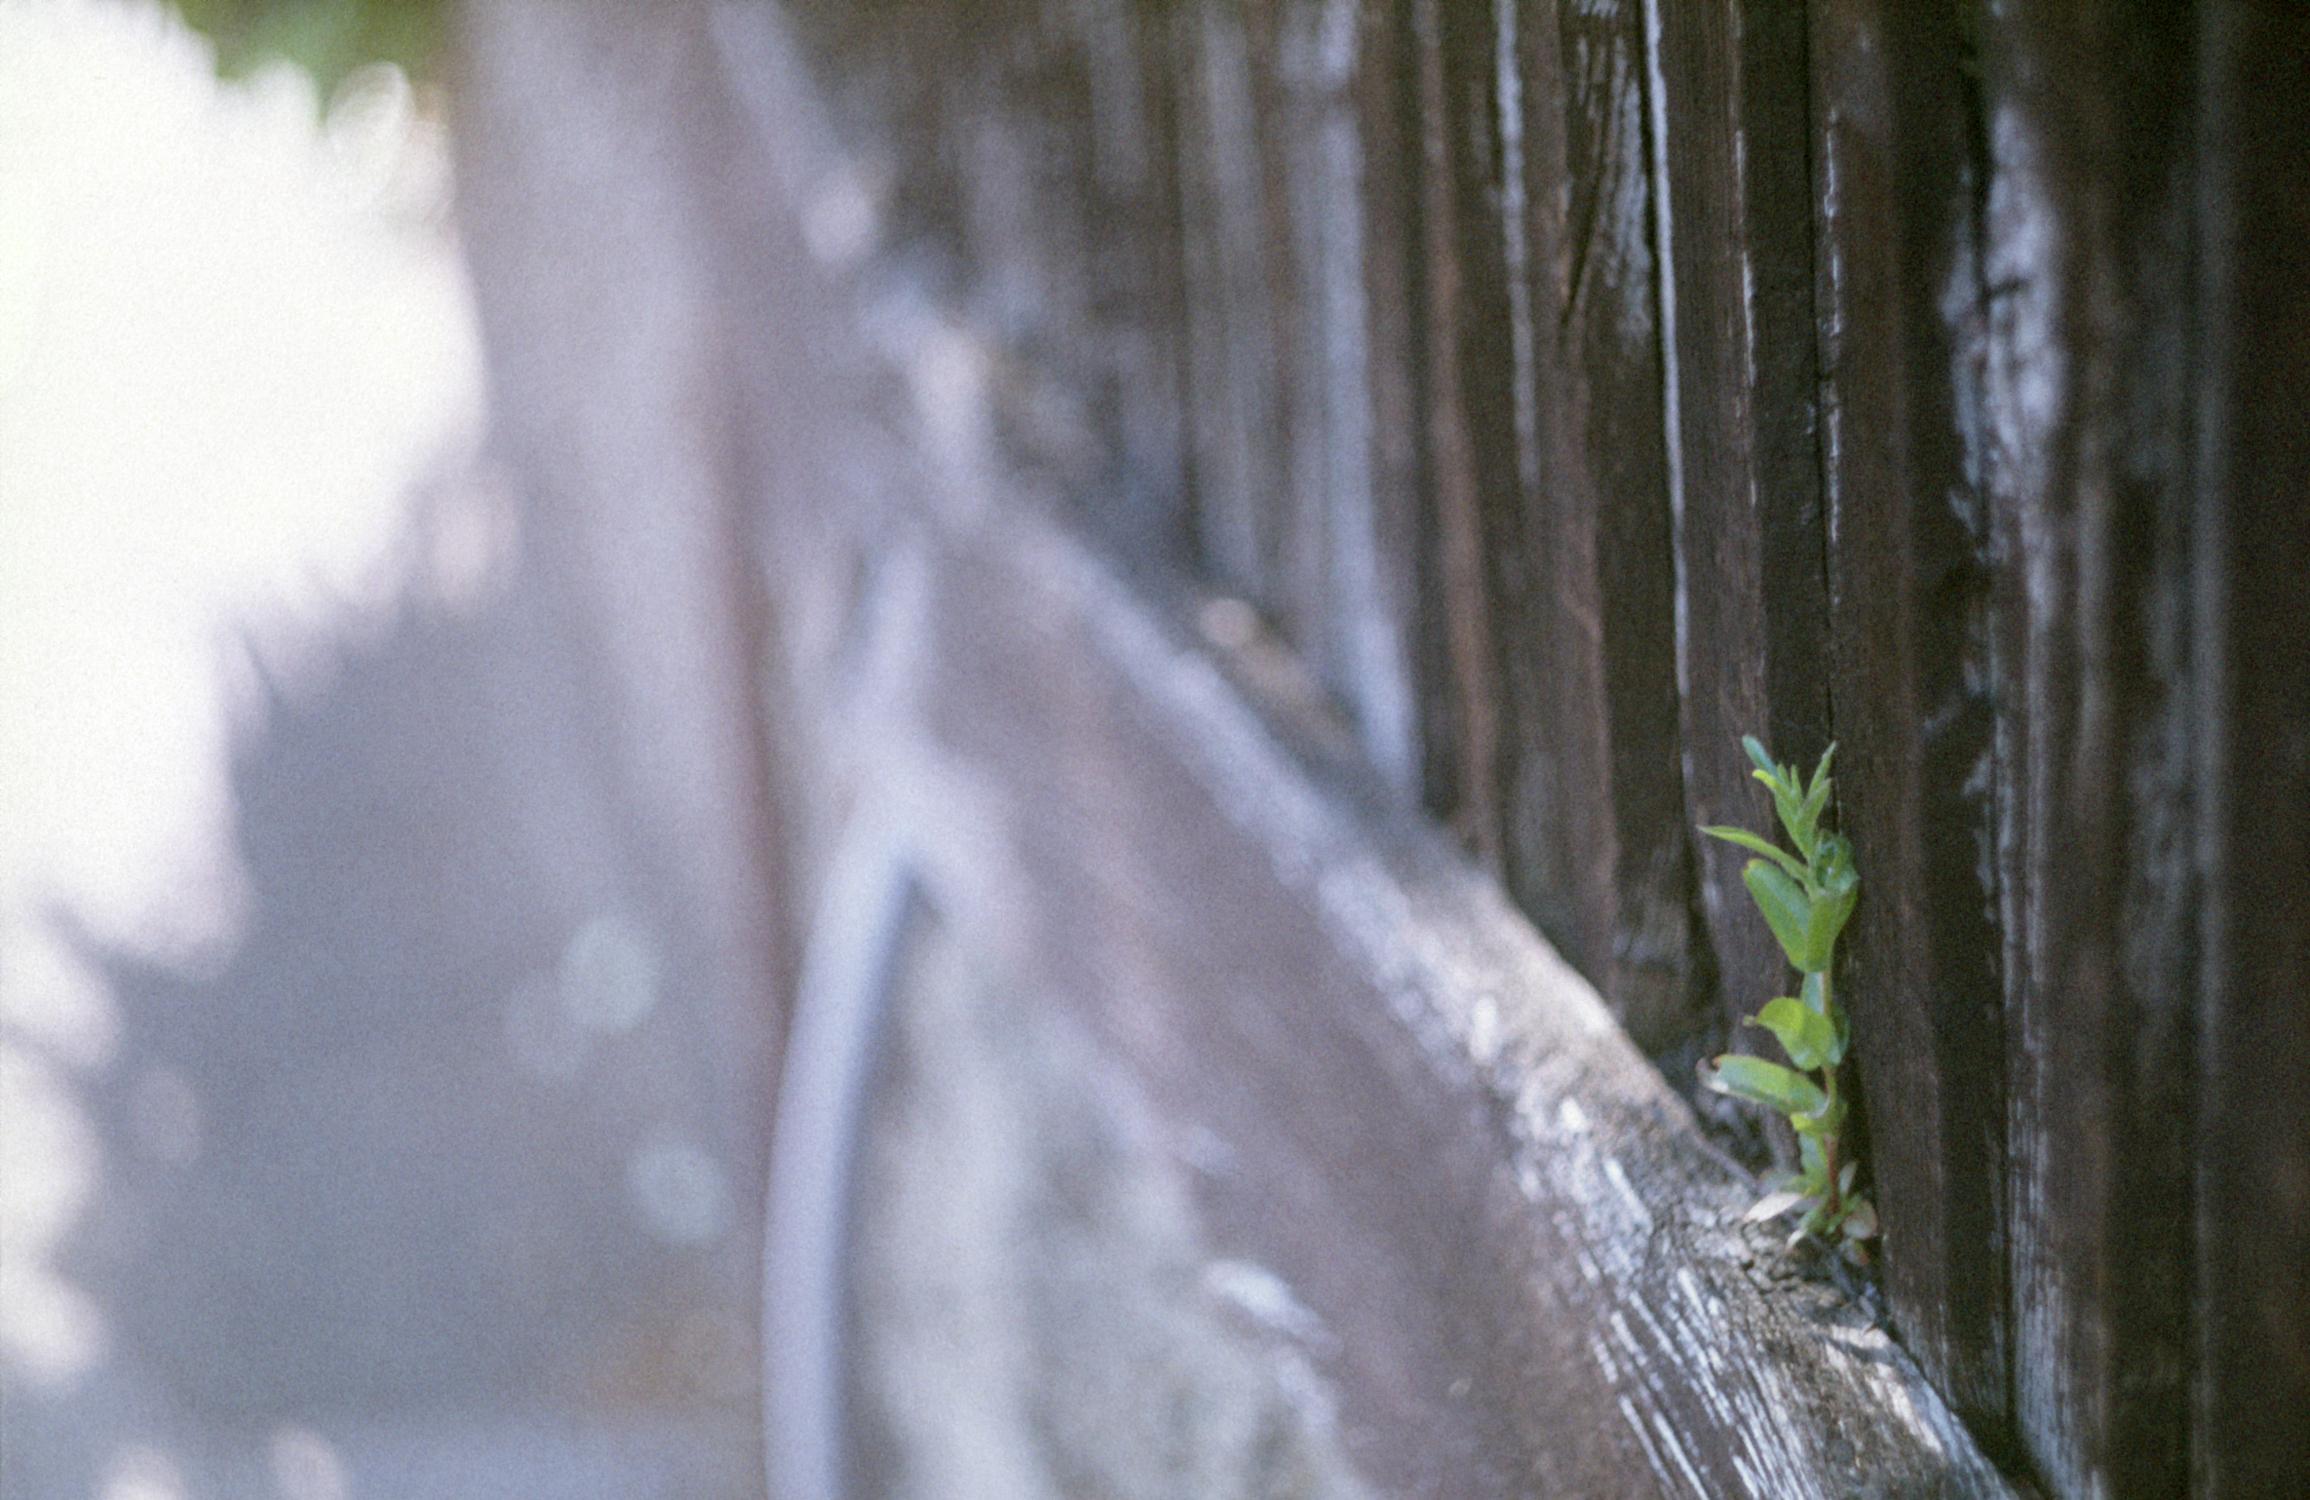 Shoot on wall (Pic: Stephen Dowling)